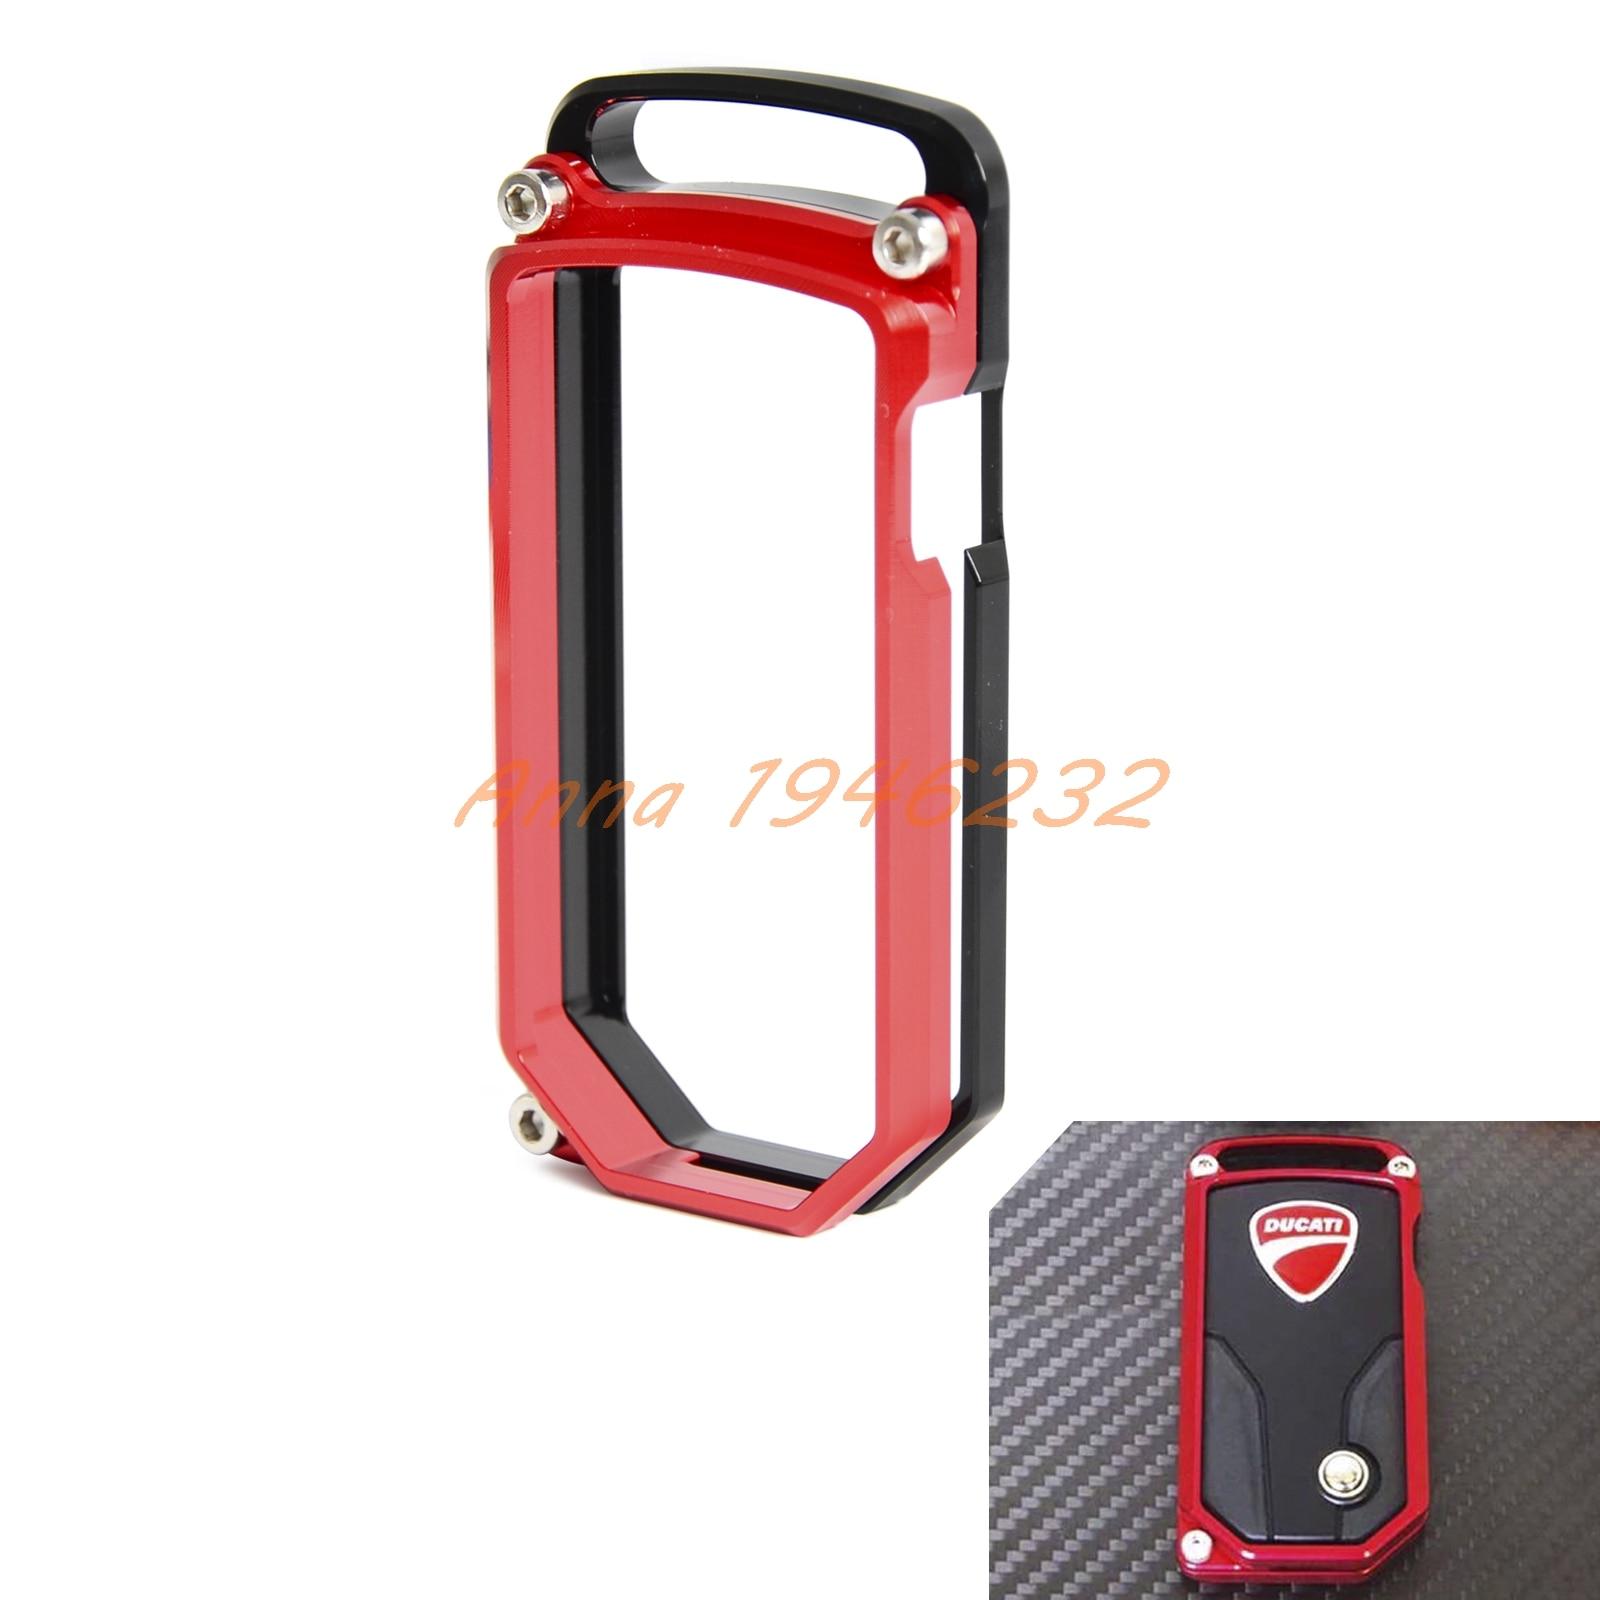 Чехол для ключей с ЧПУ SMART Key COVER для Ducati Diavel 2011-2016 Multitrada 1200/S 2010-2014 мотокросс эндуро Байк мотоцикл